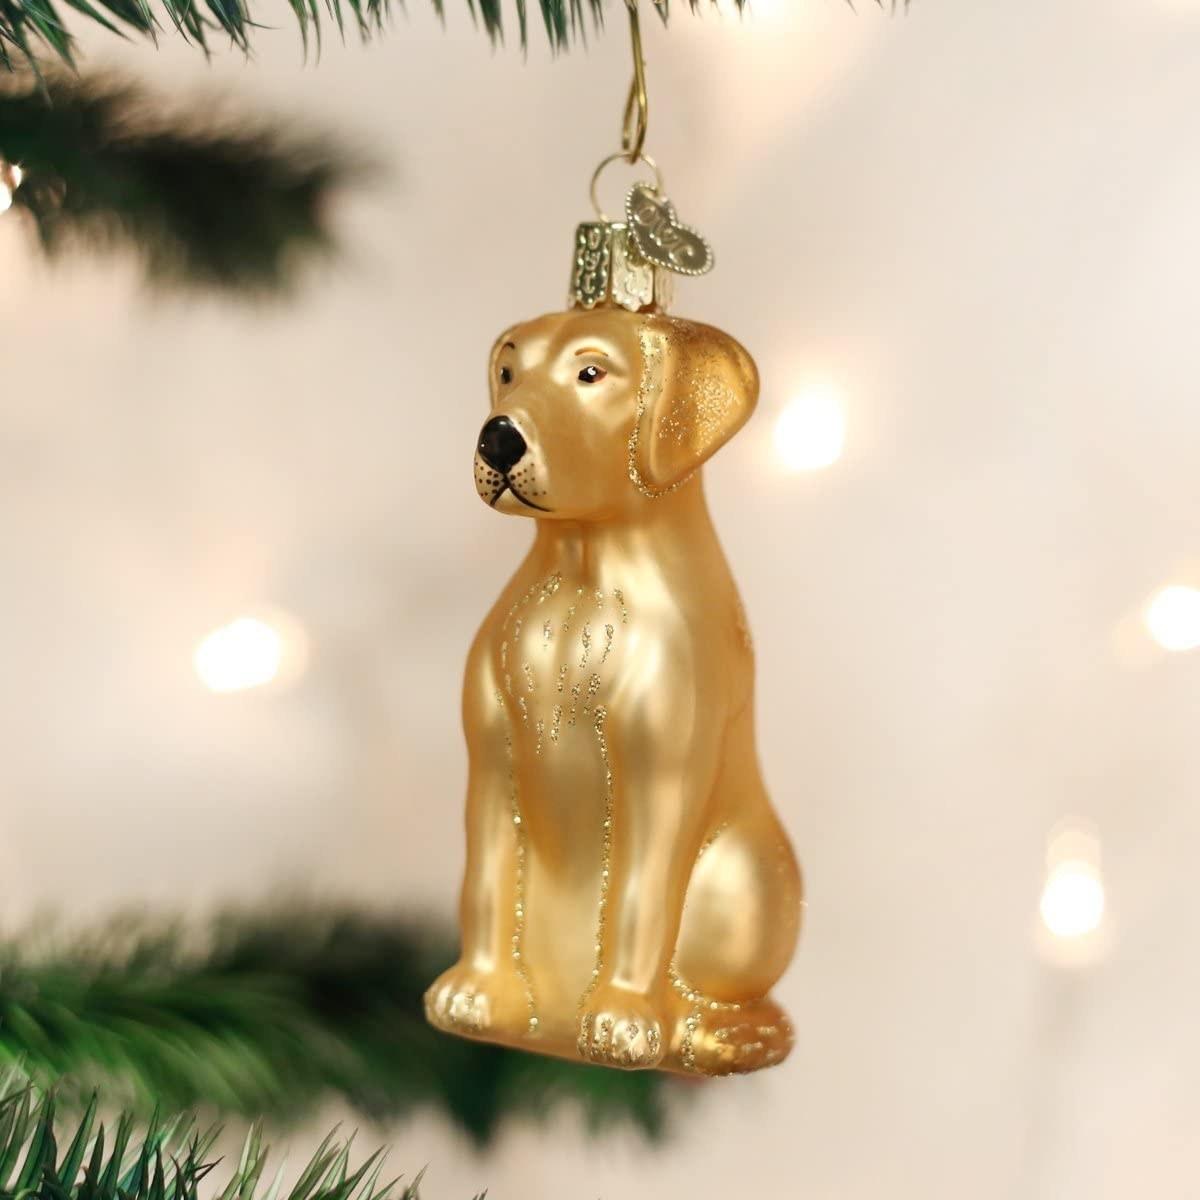 the golden ornament